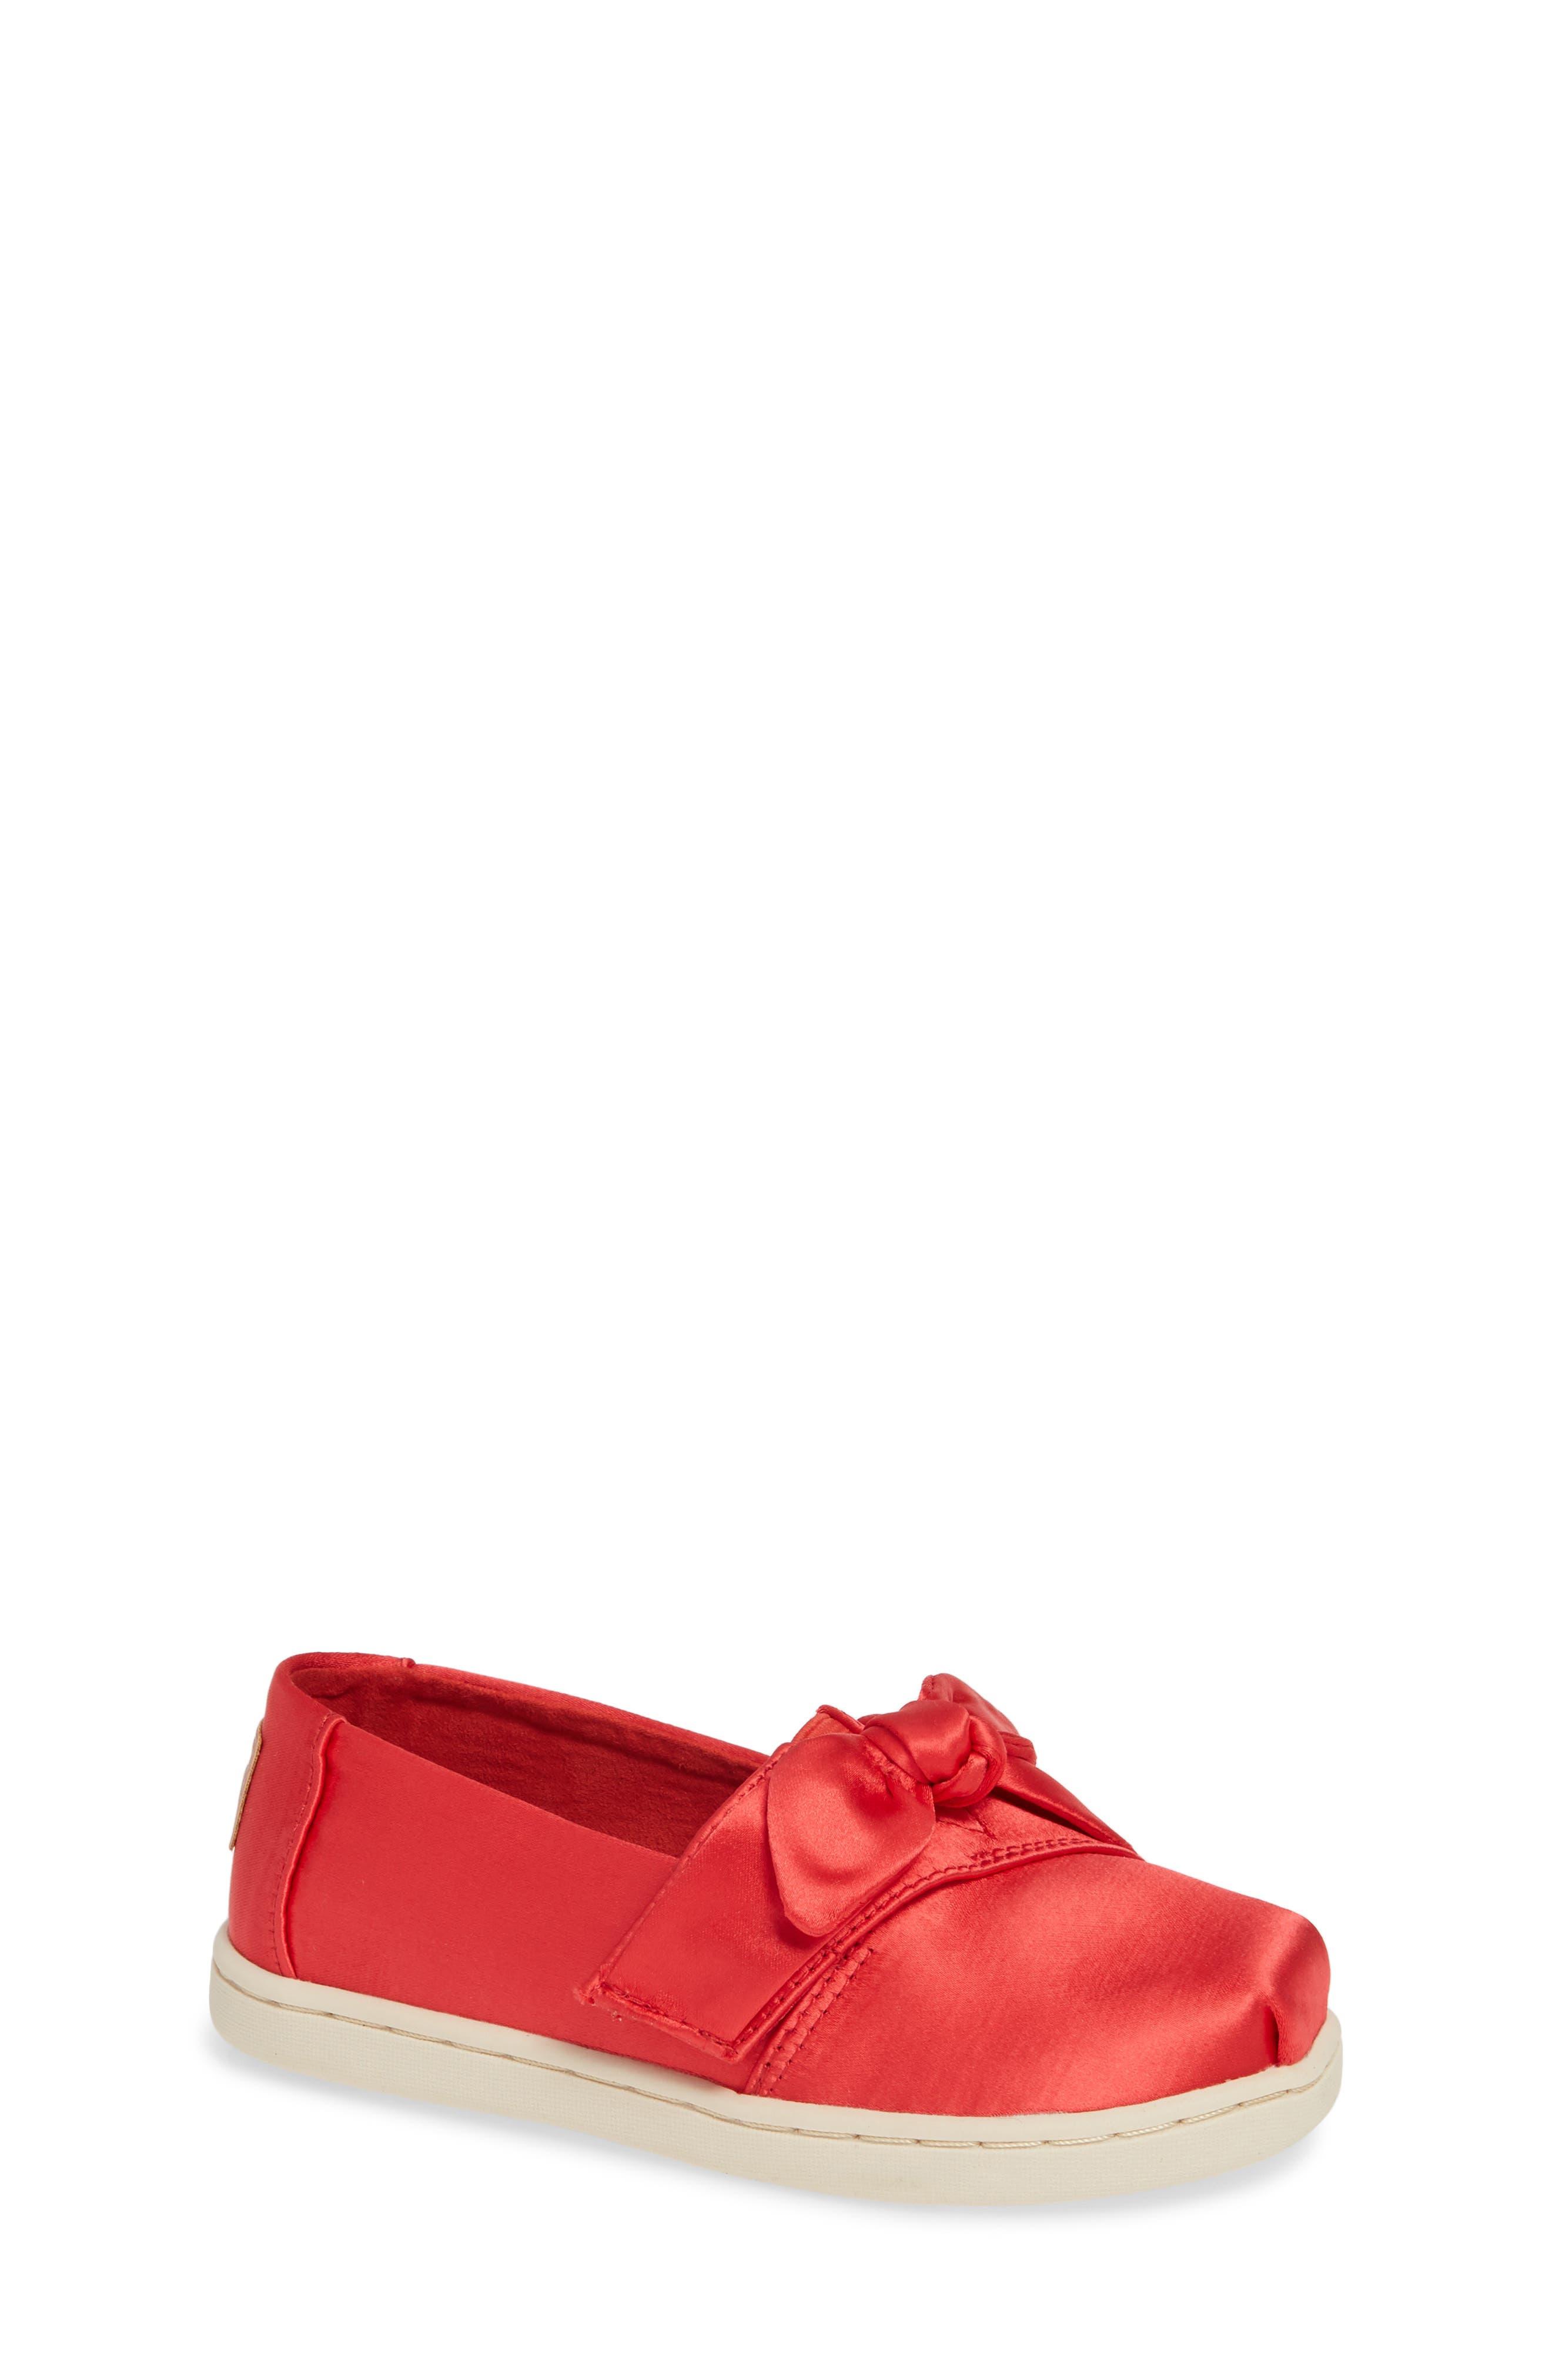 Infant Toms Alpargata Bow SlipOn Size 3 M  Red